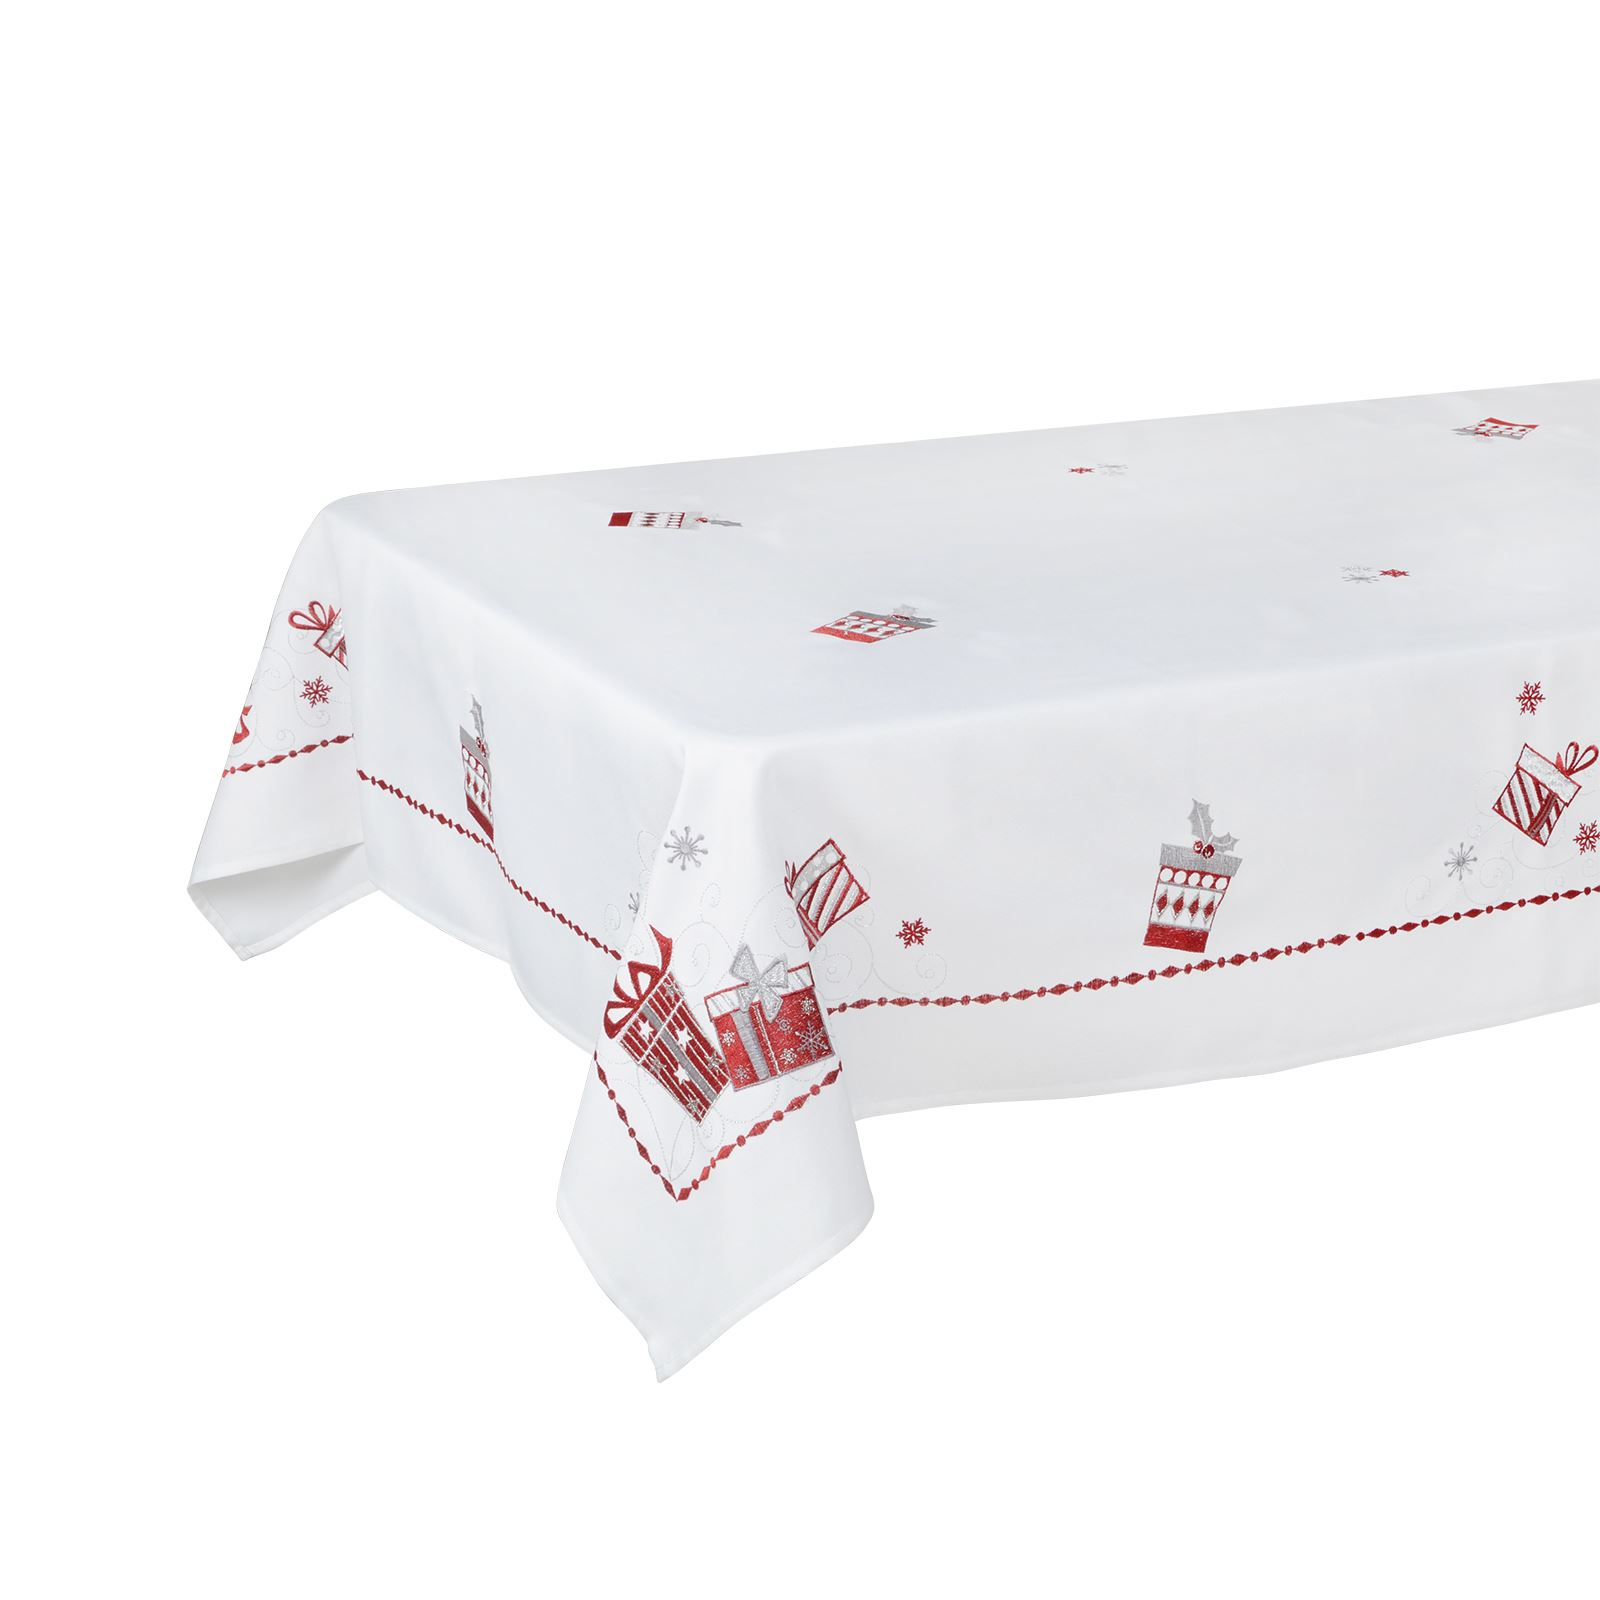 Christmas-Tablecloth-Festive-Pattern-Rectangle-Round-Fabric-Xmas-Room-Decoration Indexbild 76